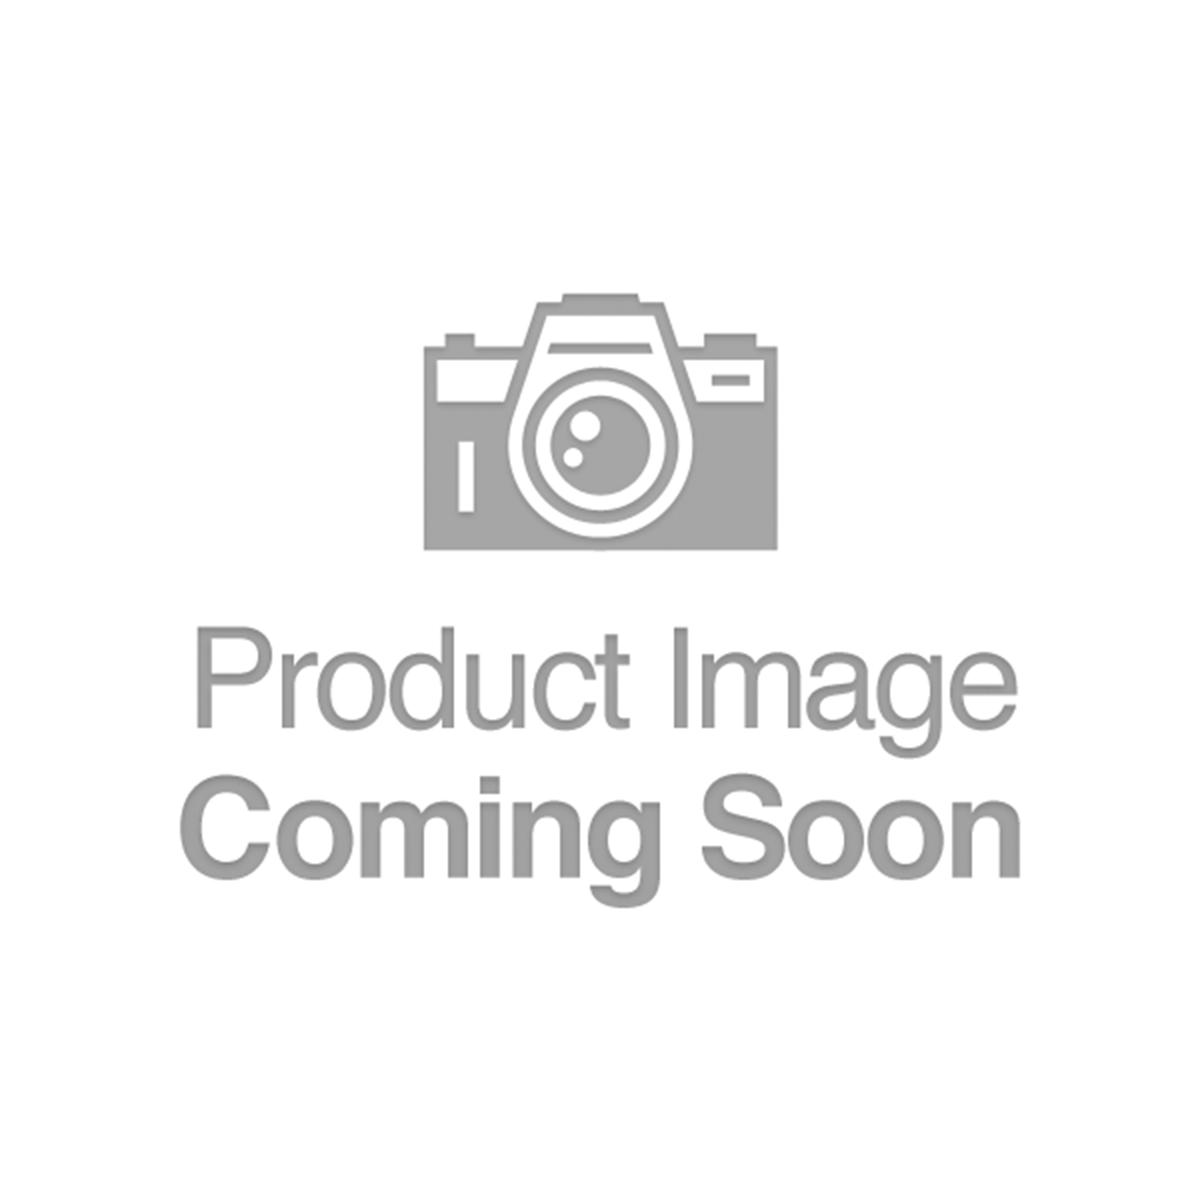 1884 3CN Three Cent Nickel PCGS PR67 (CAC)